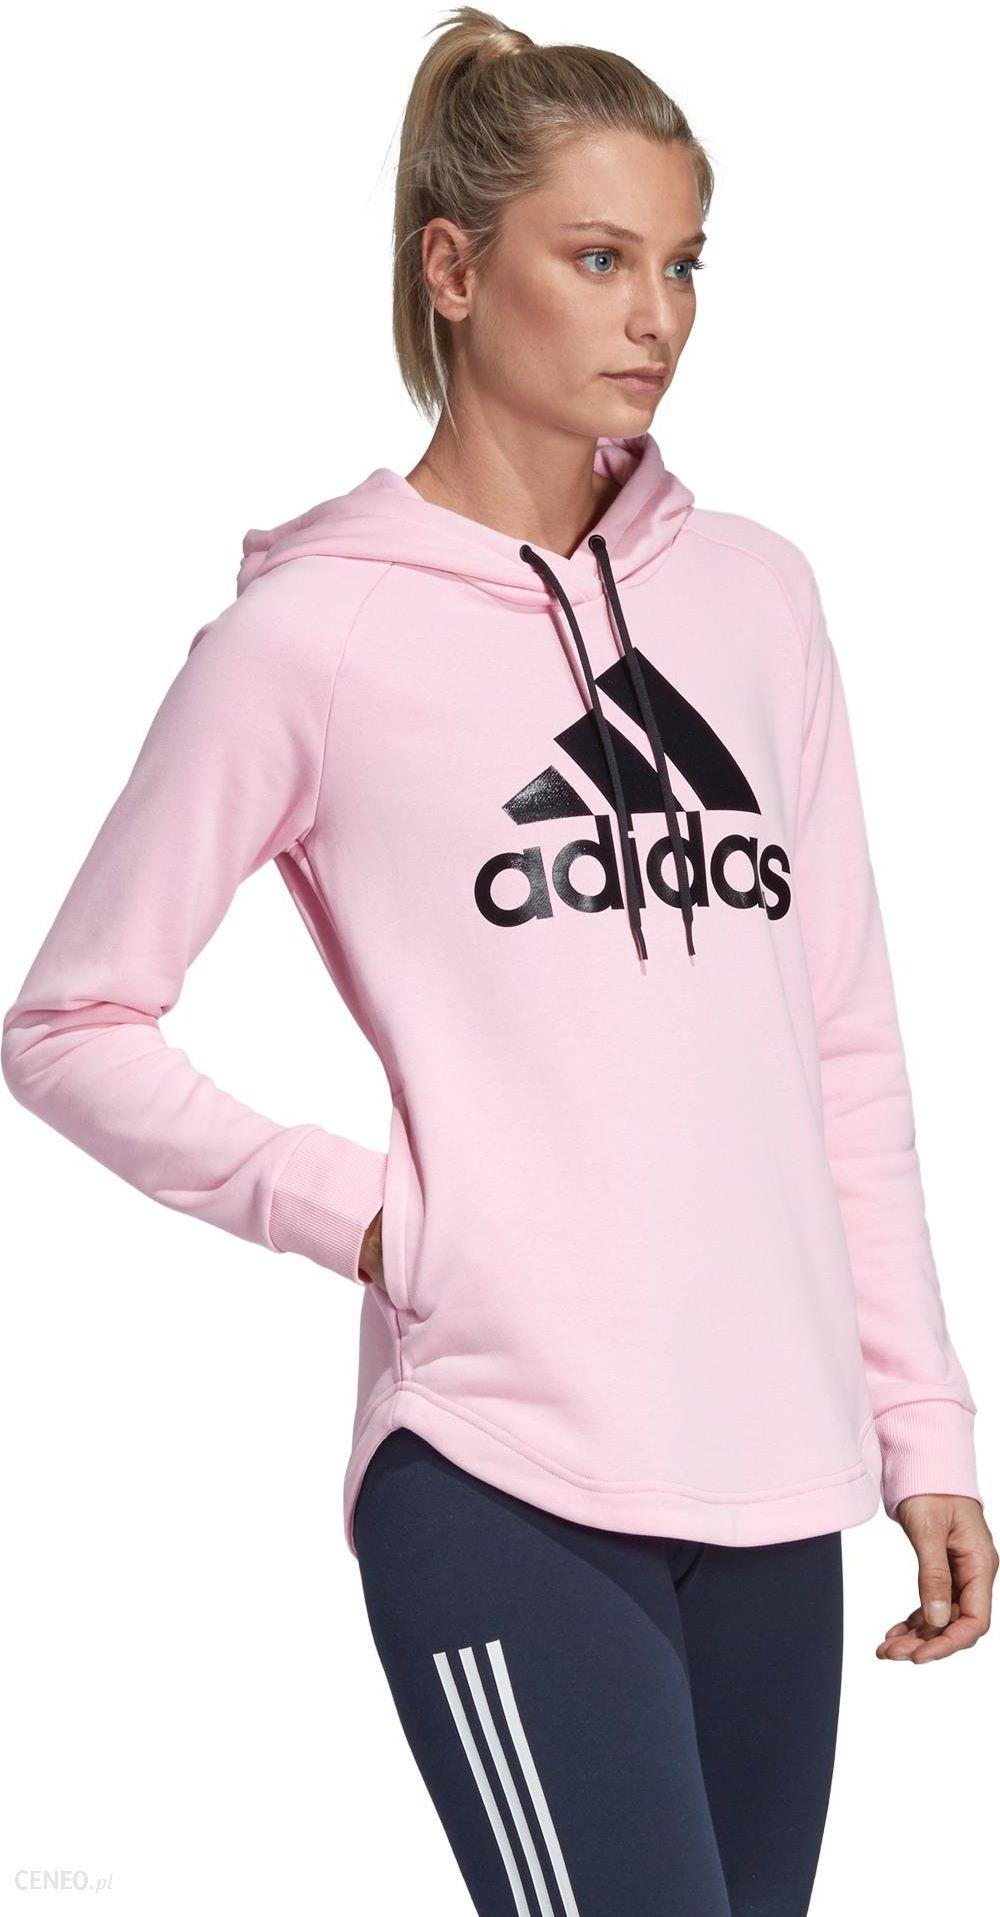 Adidas Performance Must Haves Badge Of Sport Bluza Różowy S Ceny i opinie Ceneo.pl